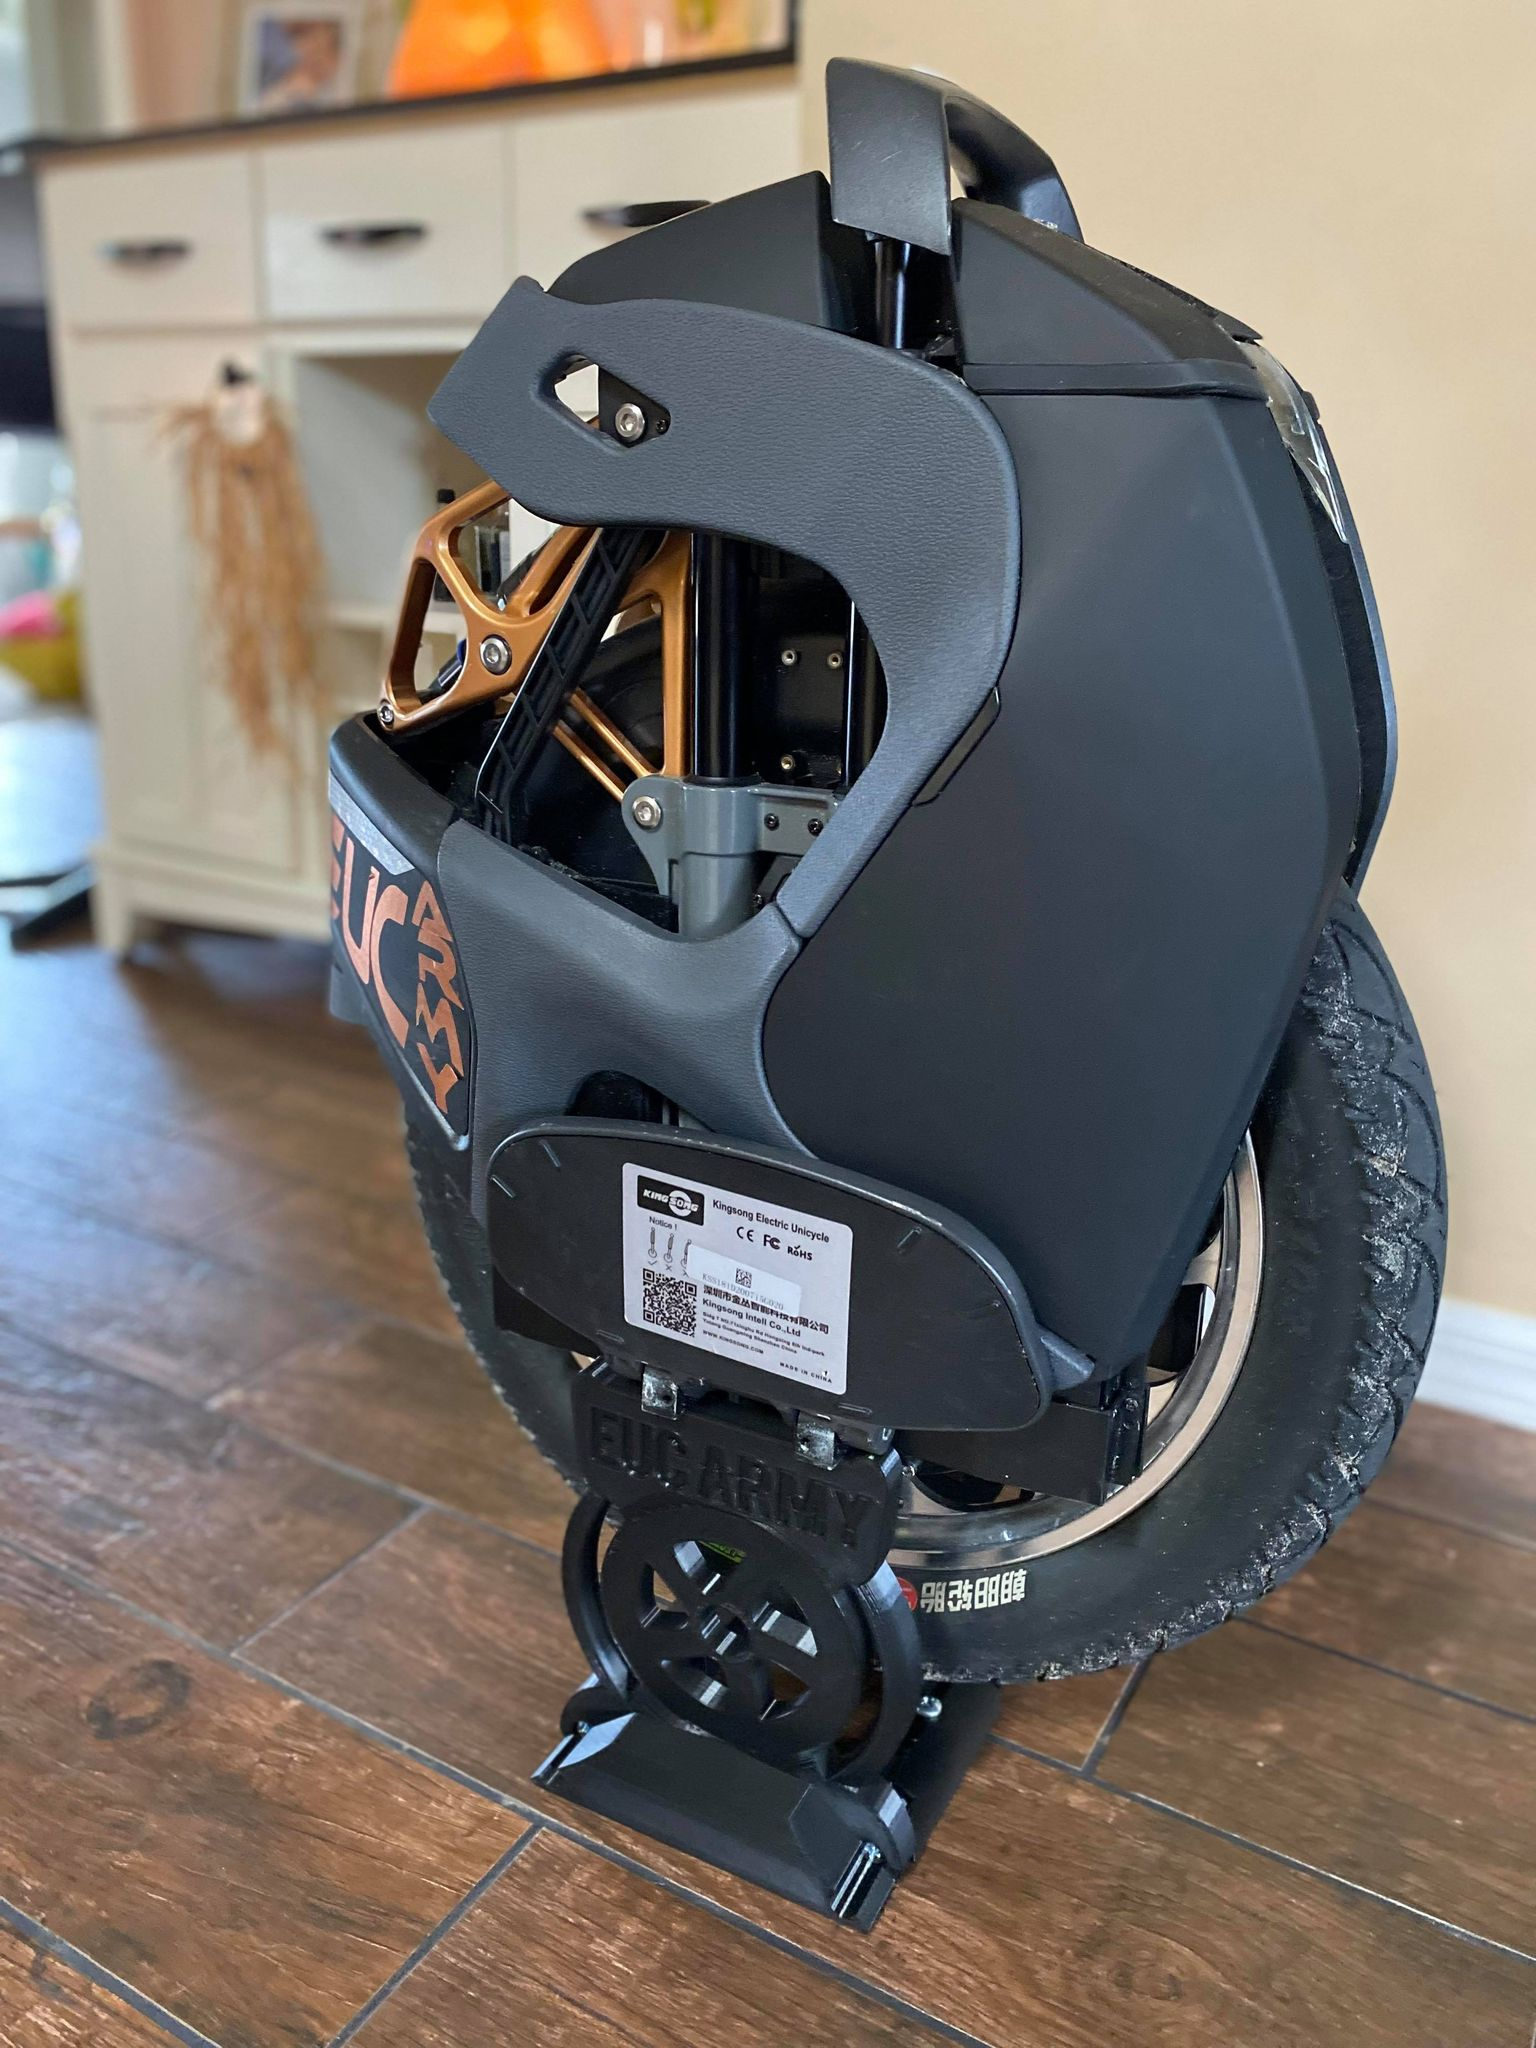 EUC Stand 3.9 Tall Boy Adjustable XS - Fits ALL wheels